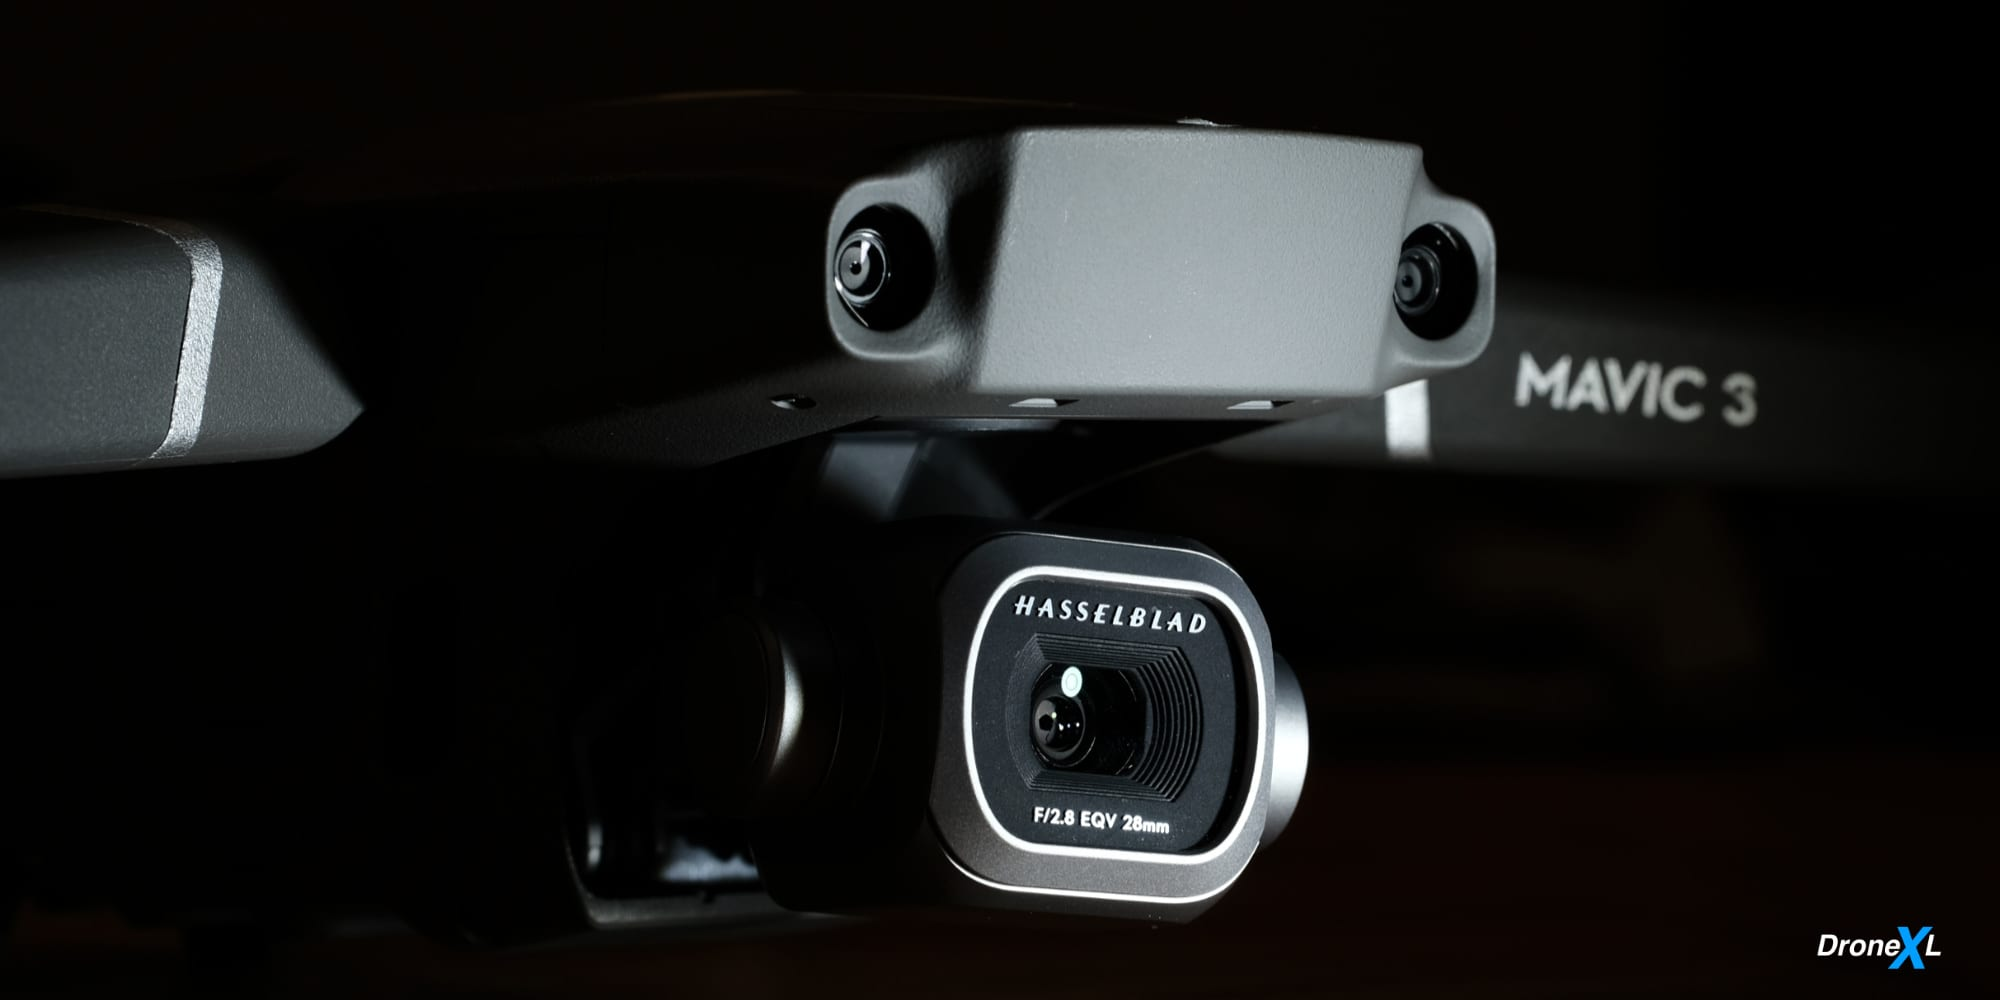 DJI Mavic 3 feature wishlist: M4/3 sensor, Hasselblad tech, mechanical shutter, interchangeable cameras and lenses